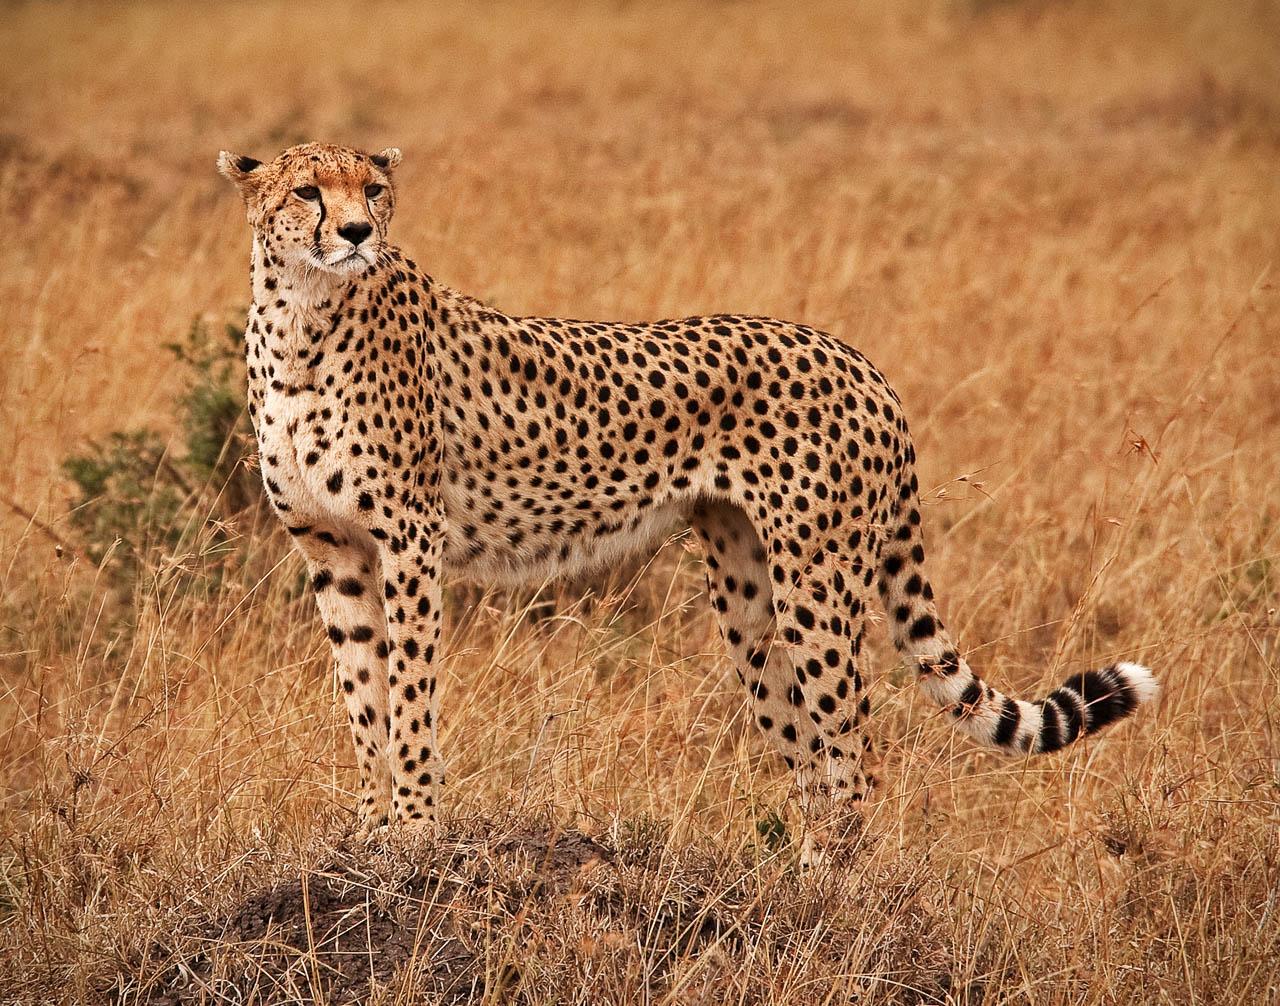 Cheetah on the savannah